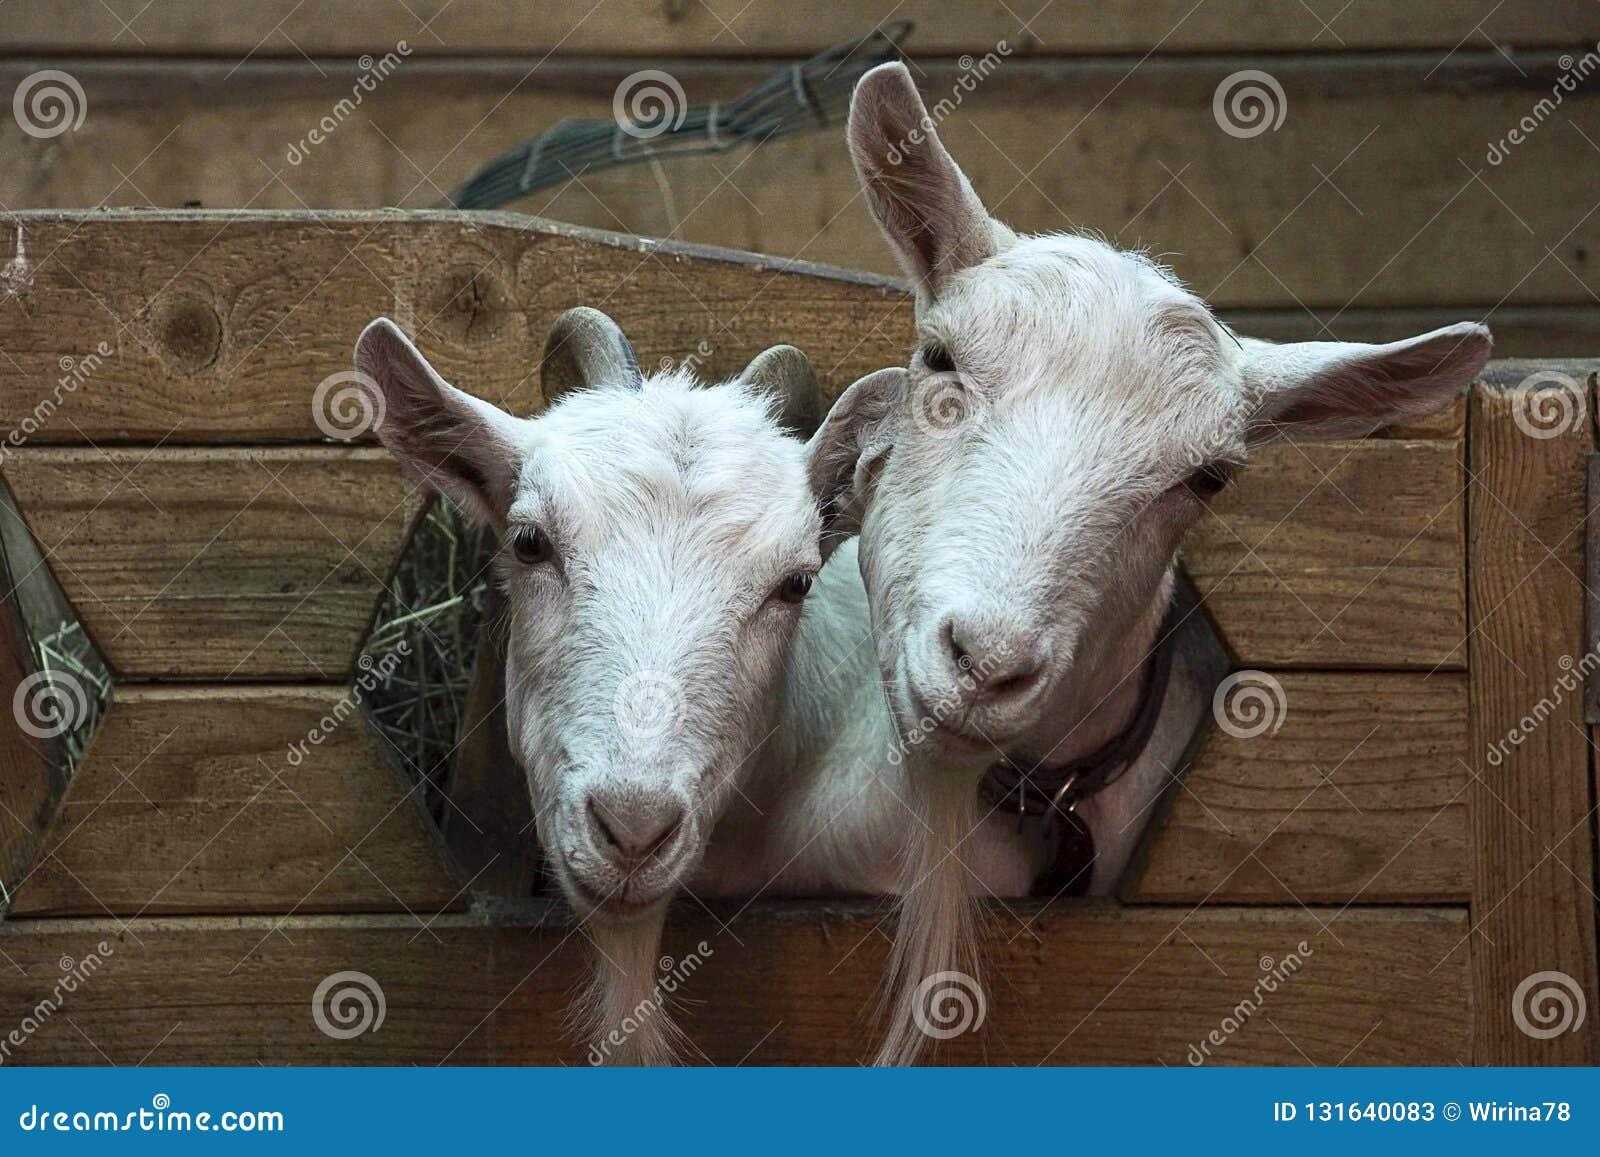 Twee leuke grappige geiten